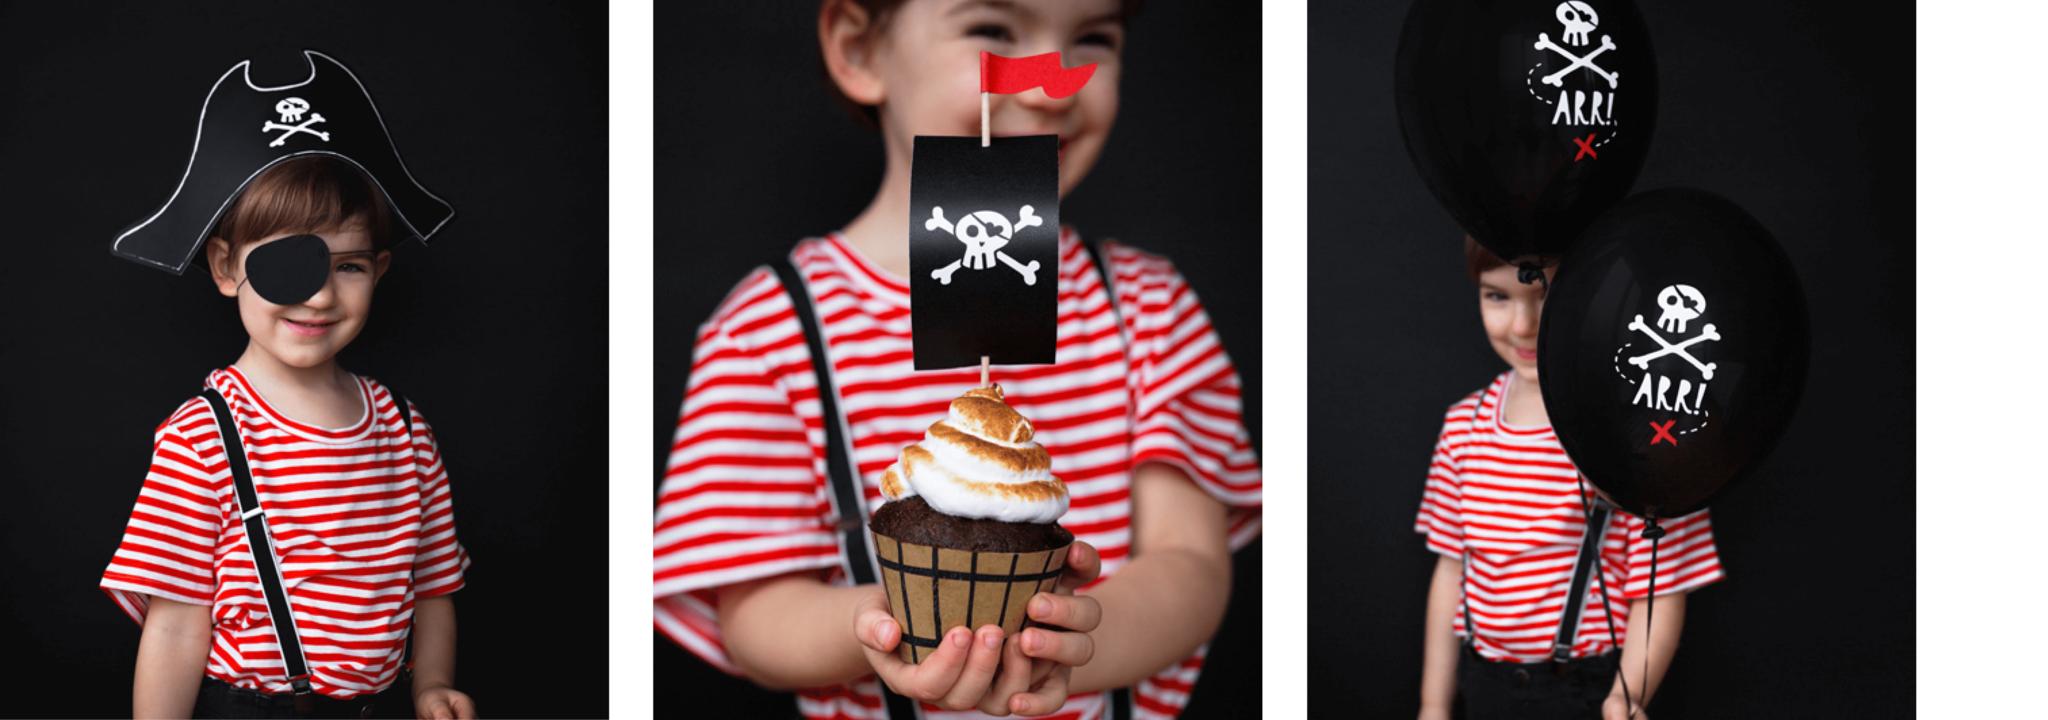 Piraten kinderfeestje thuis organiseren